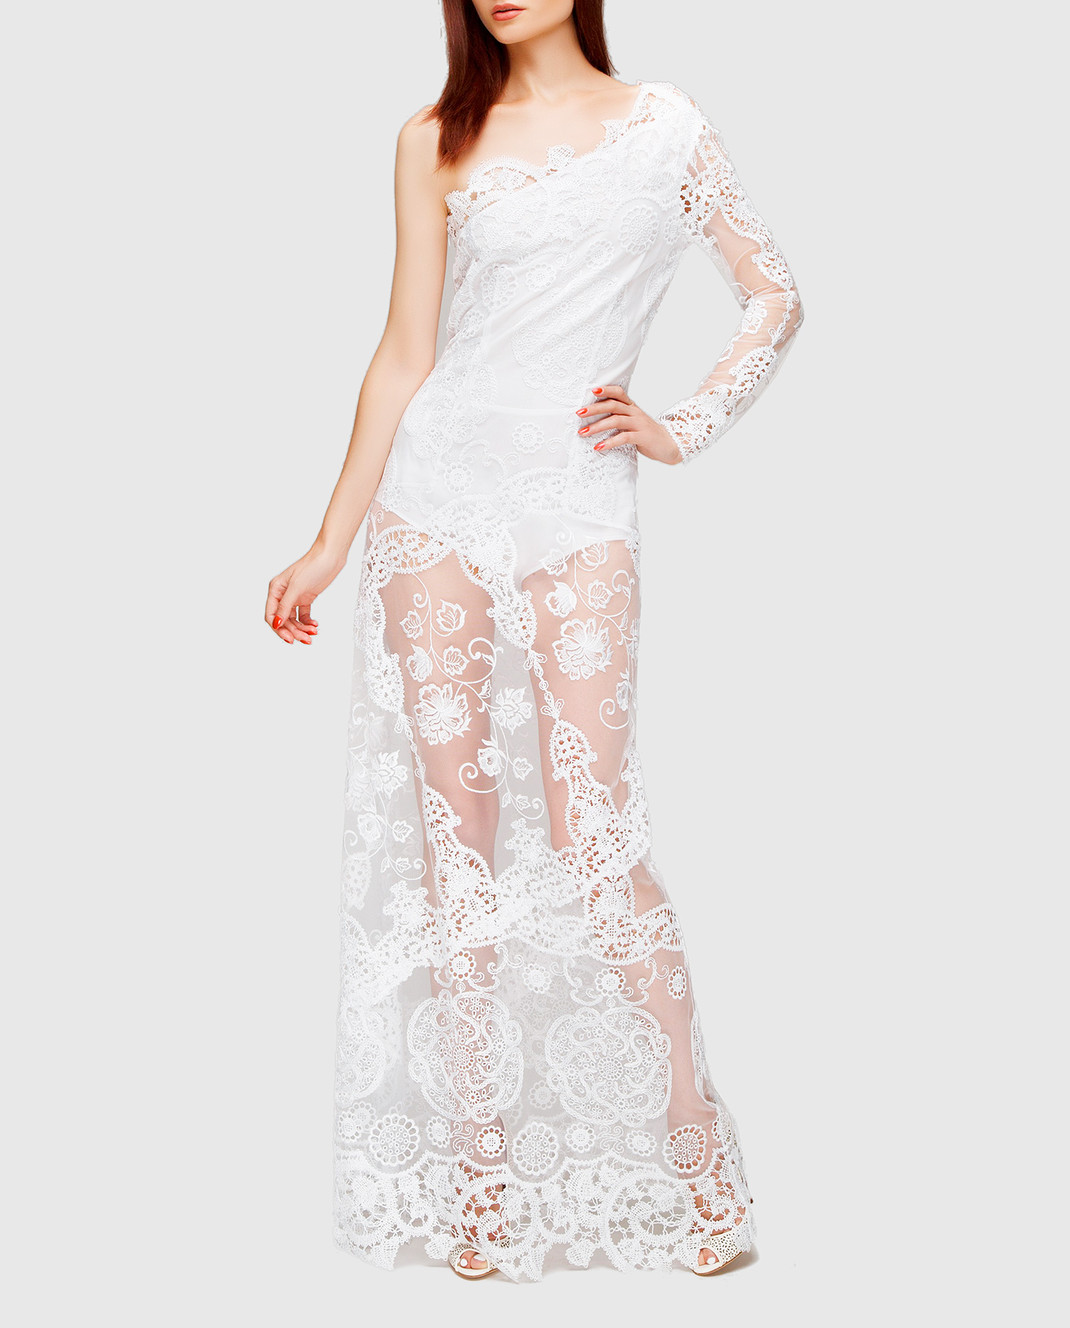 Charo Ruiz Белое платье с кружевом 00354